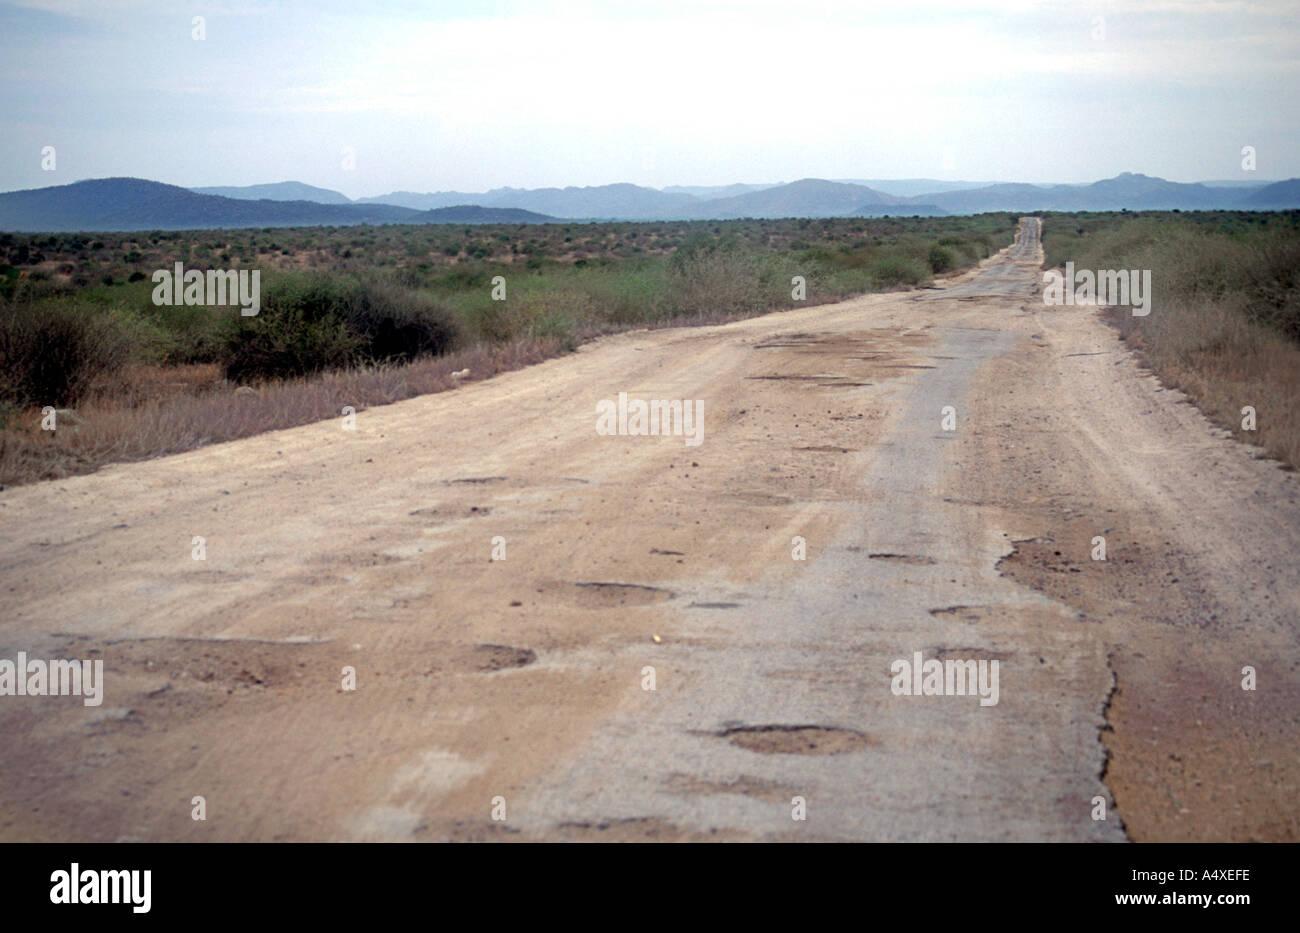 The potholed road between Lobito and Lubango in southern Angola. - Stock Image